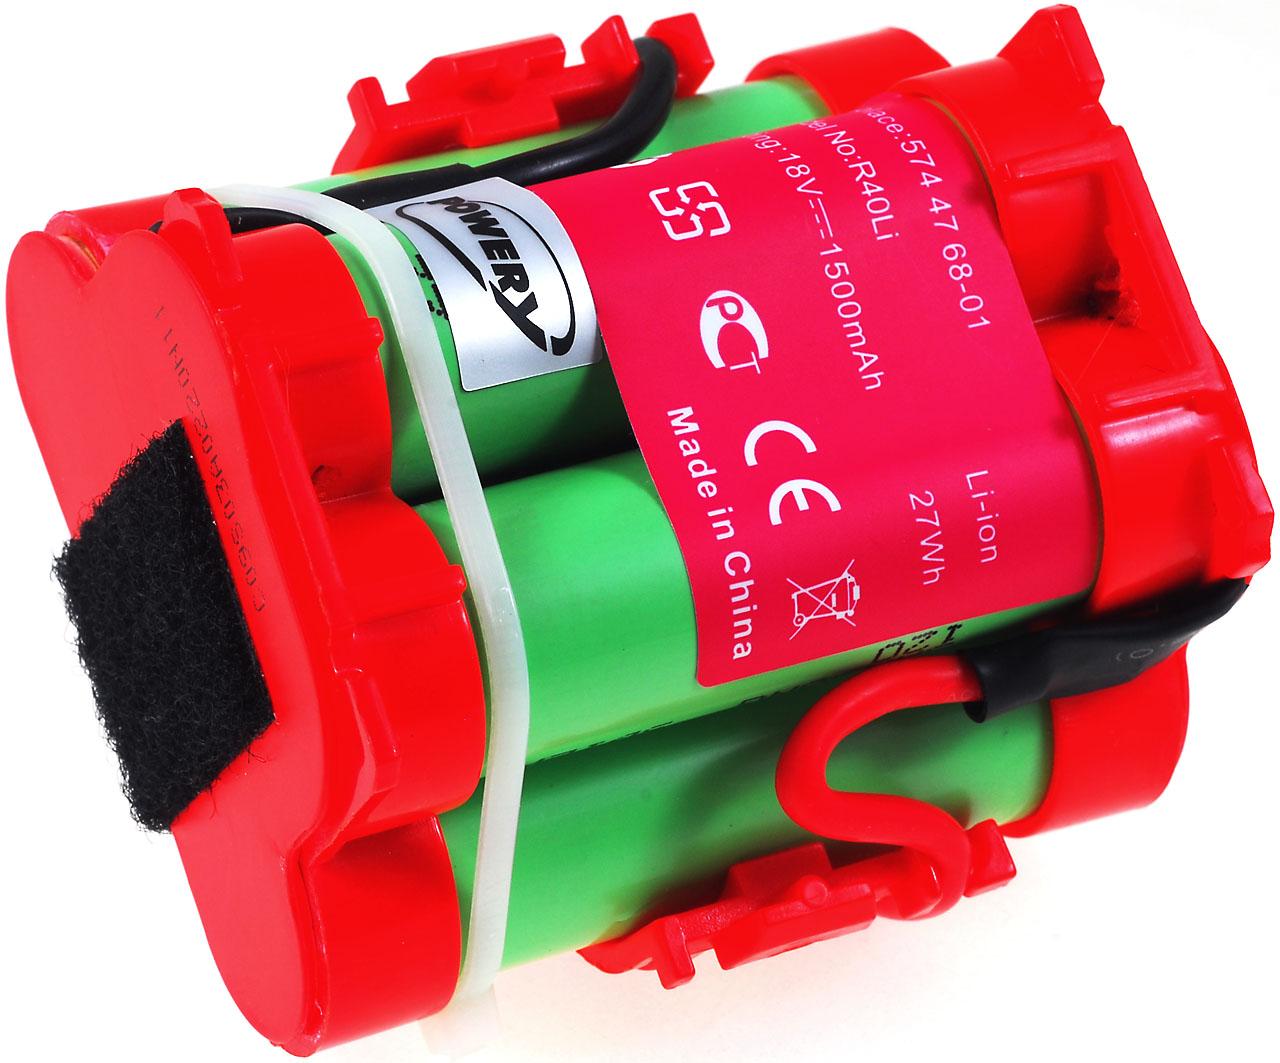 Acumulator compatibil Gardena model 574 47 68-01